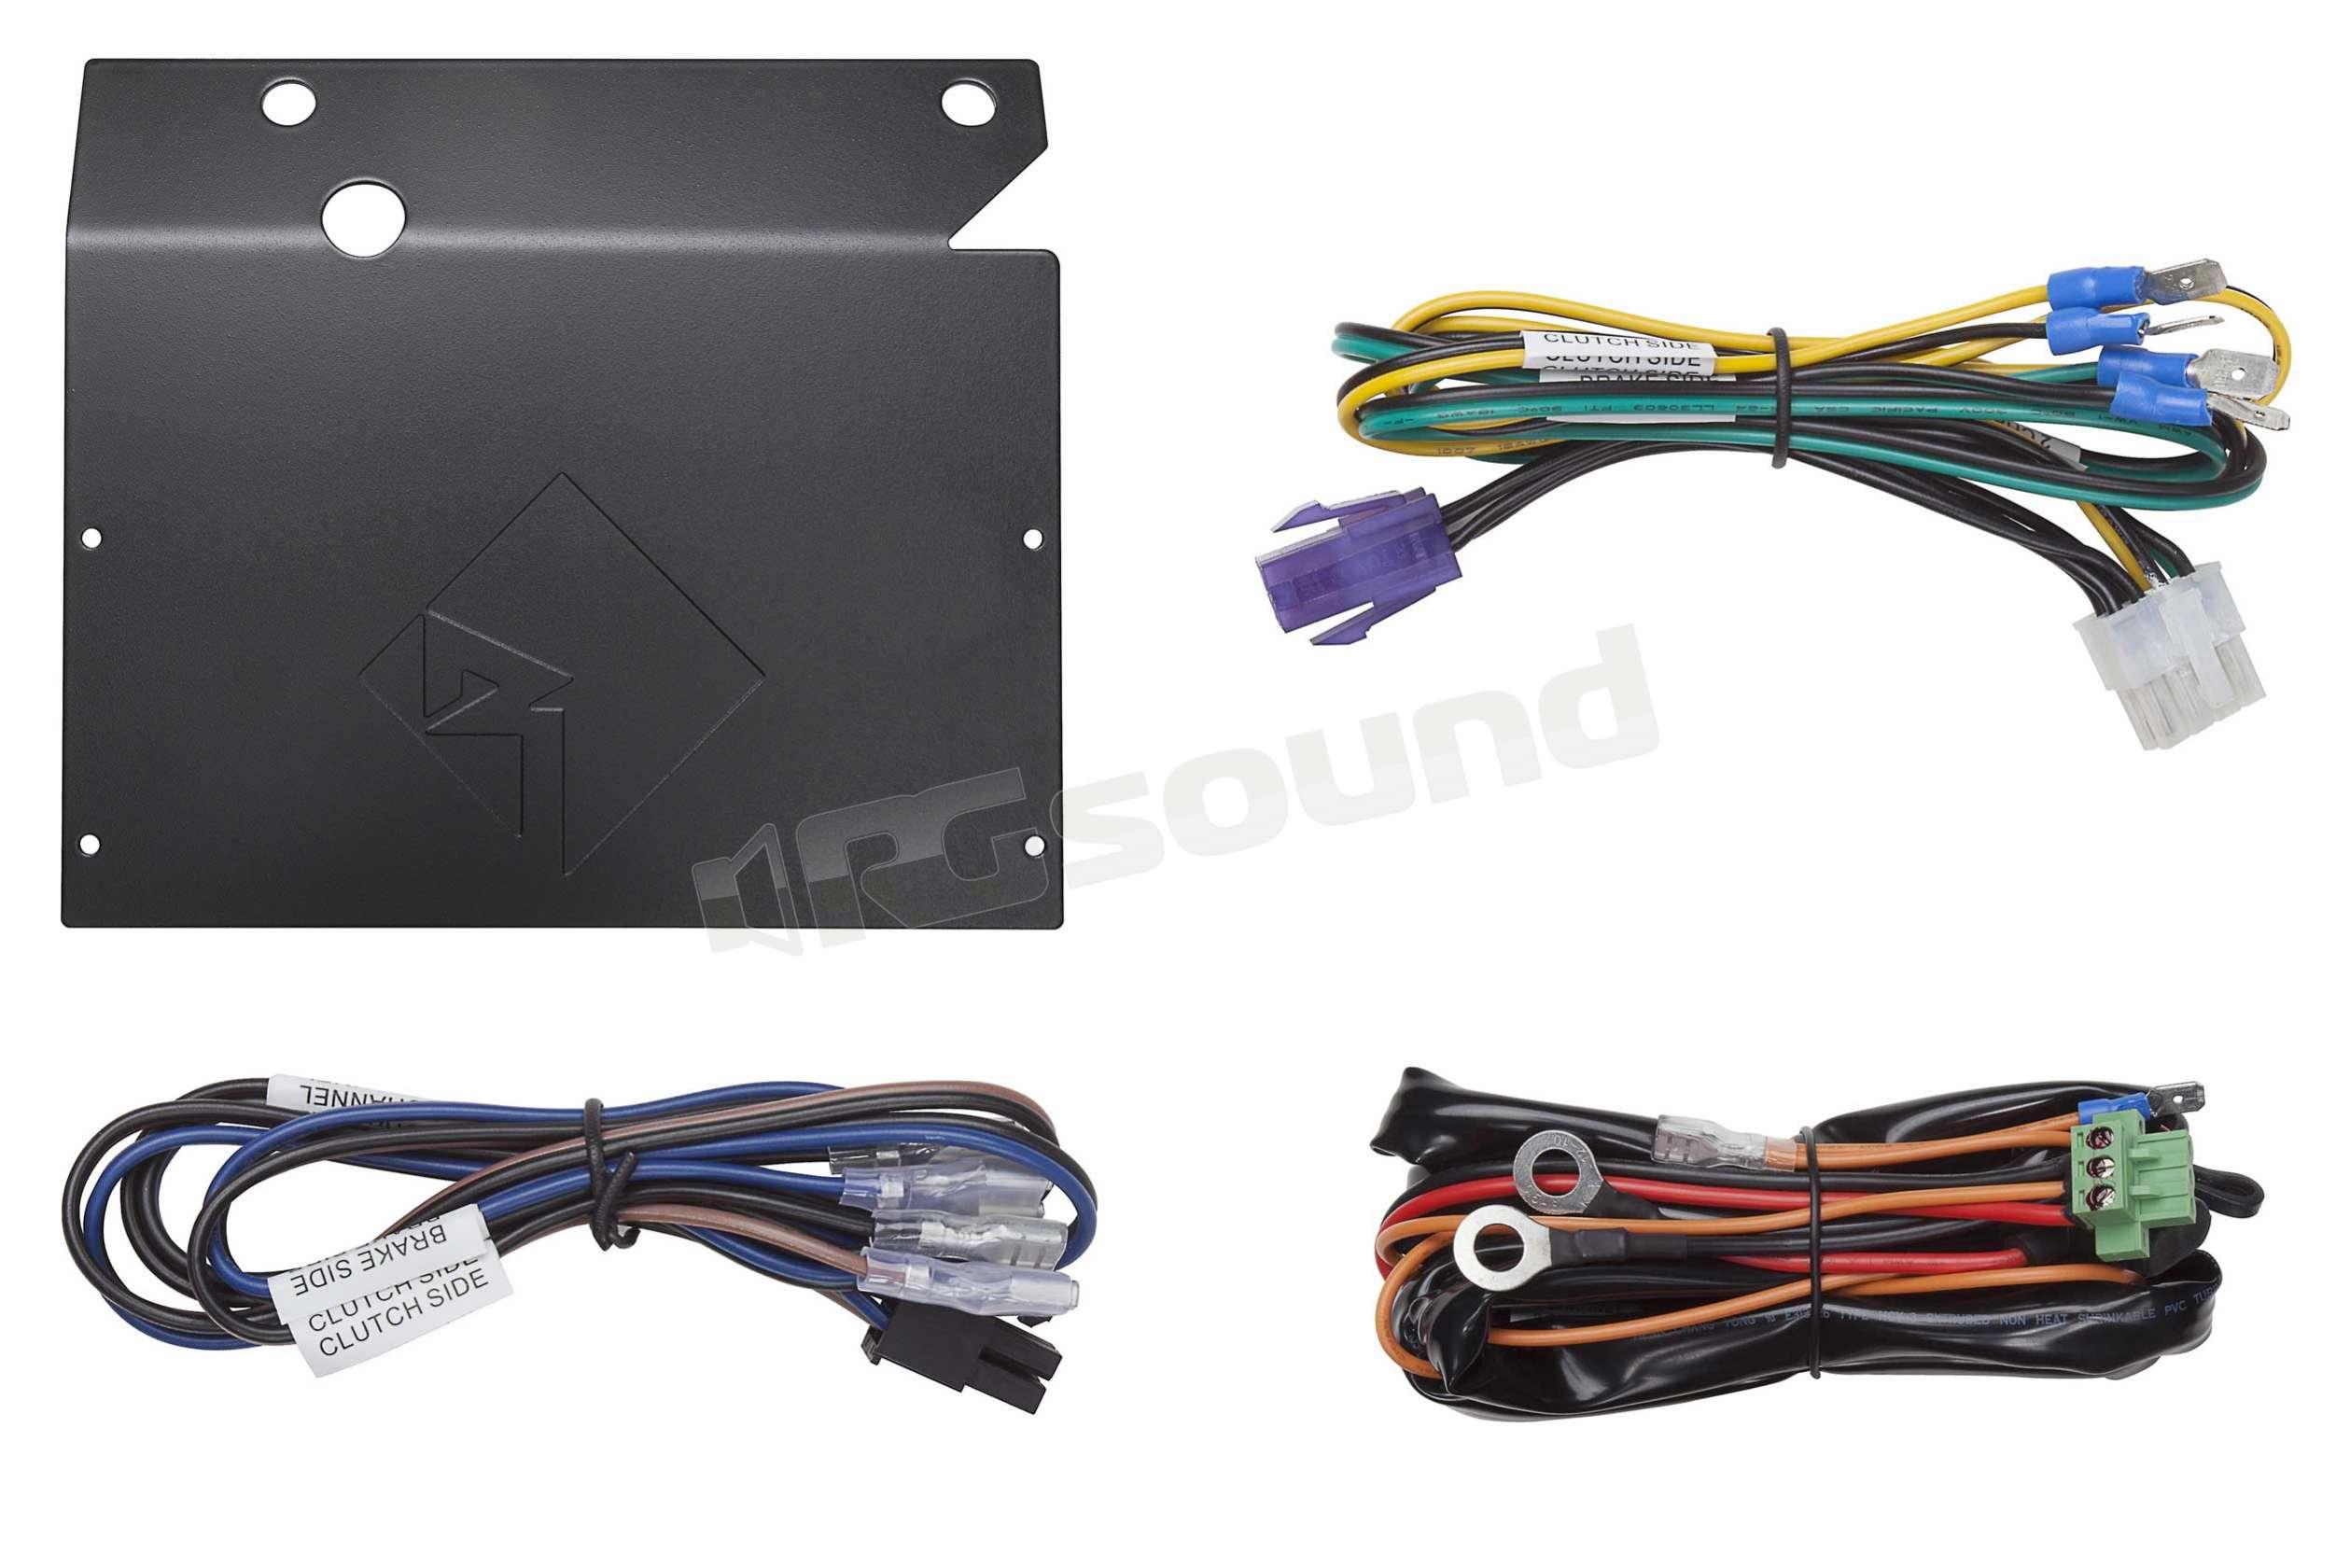 Mini Cooper Wds Mini Wiring Diagram System : Mini cooper wds wiring diagram system circuit